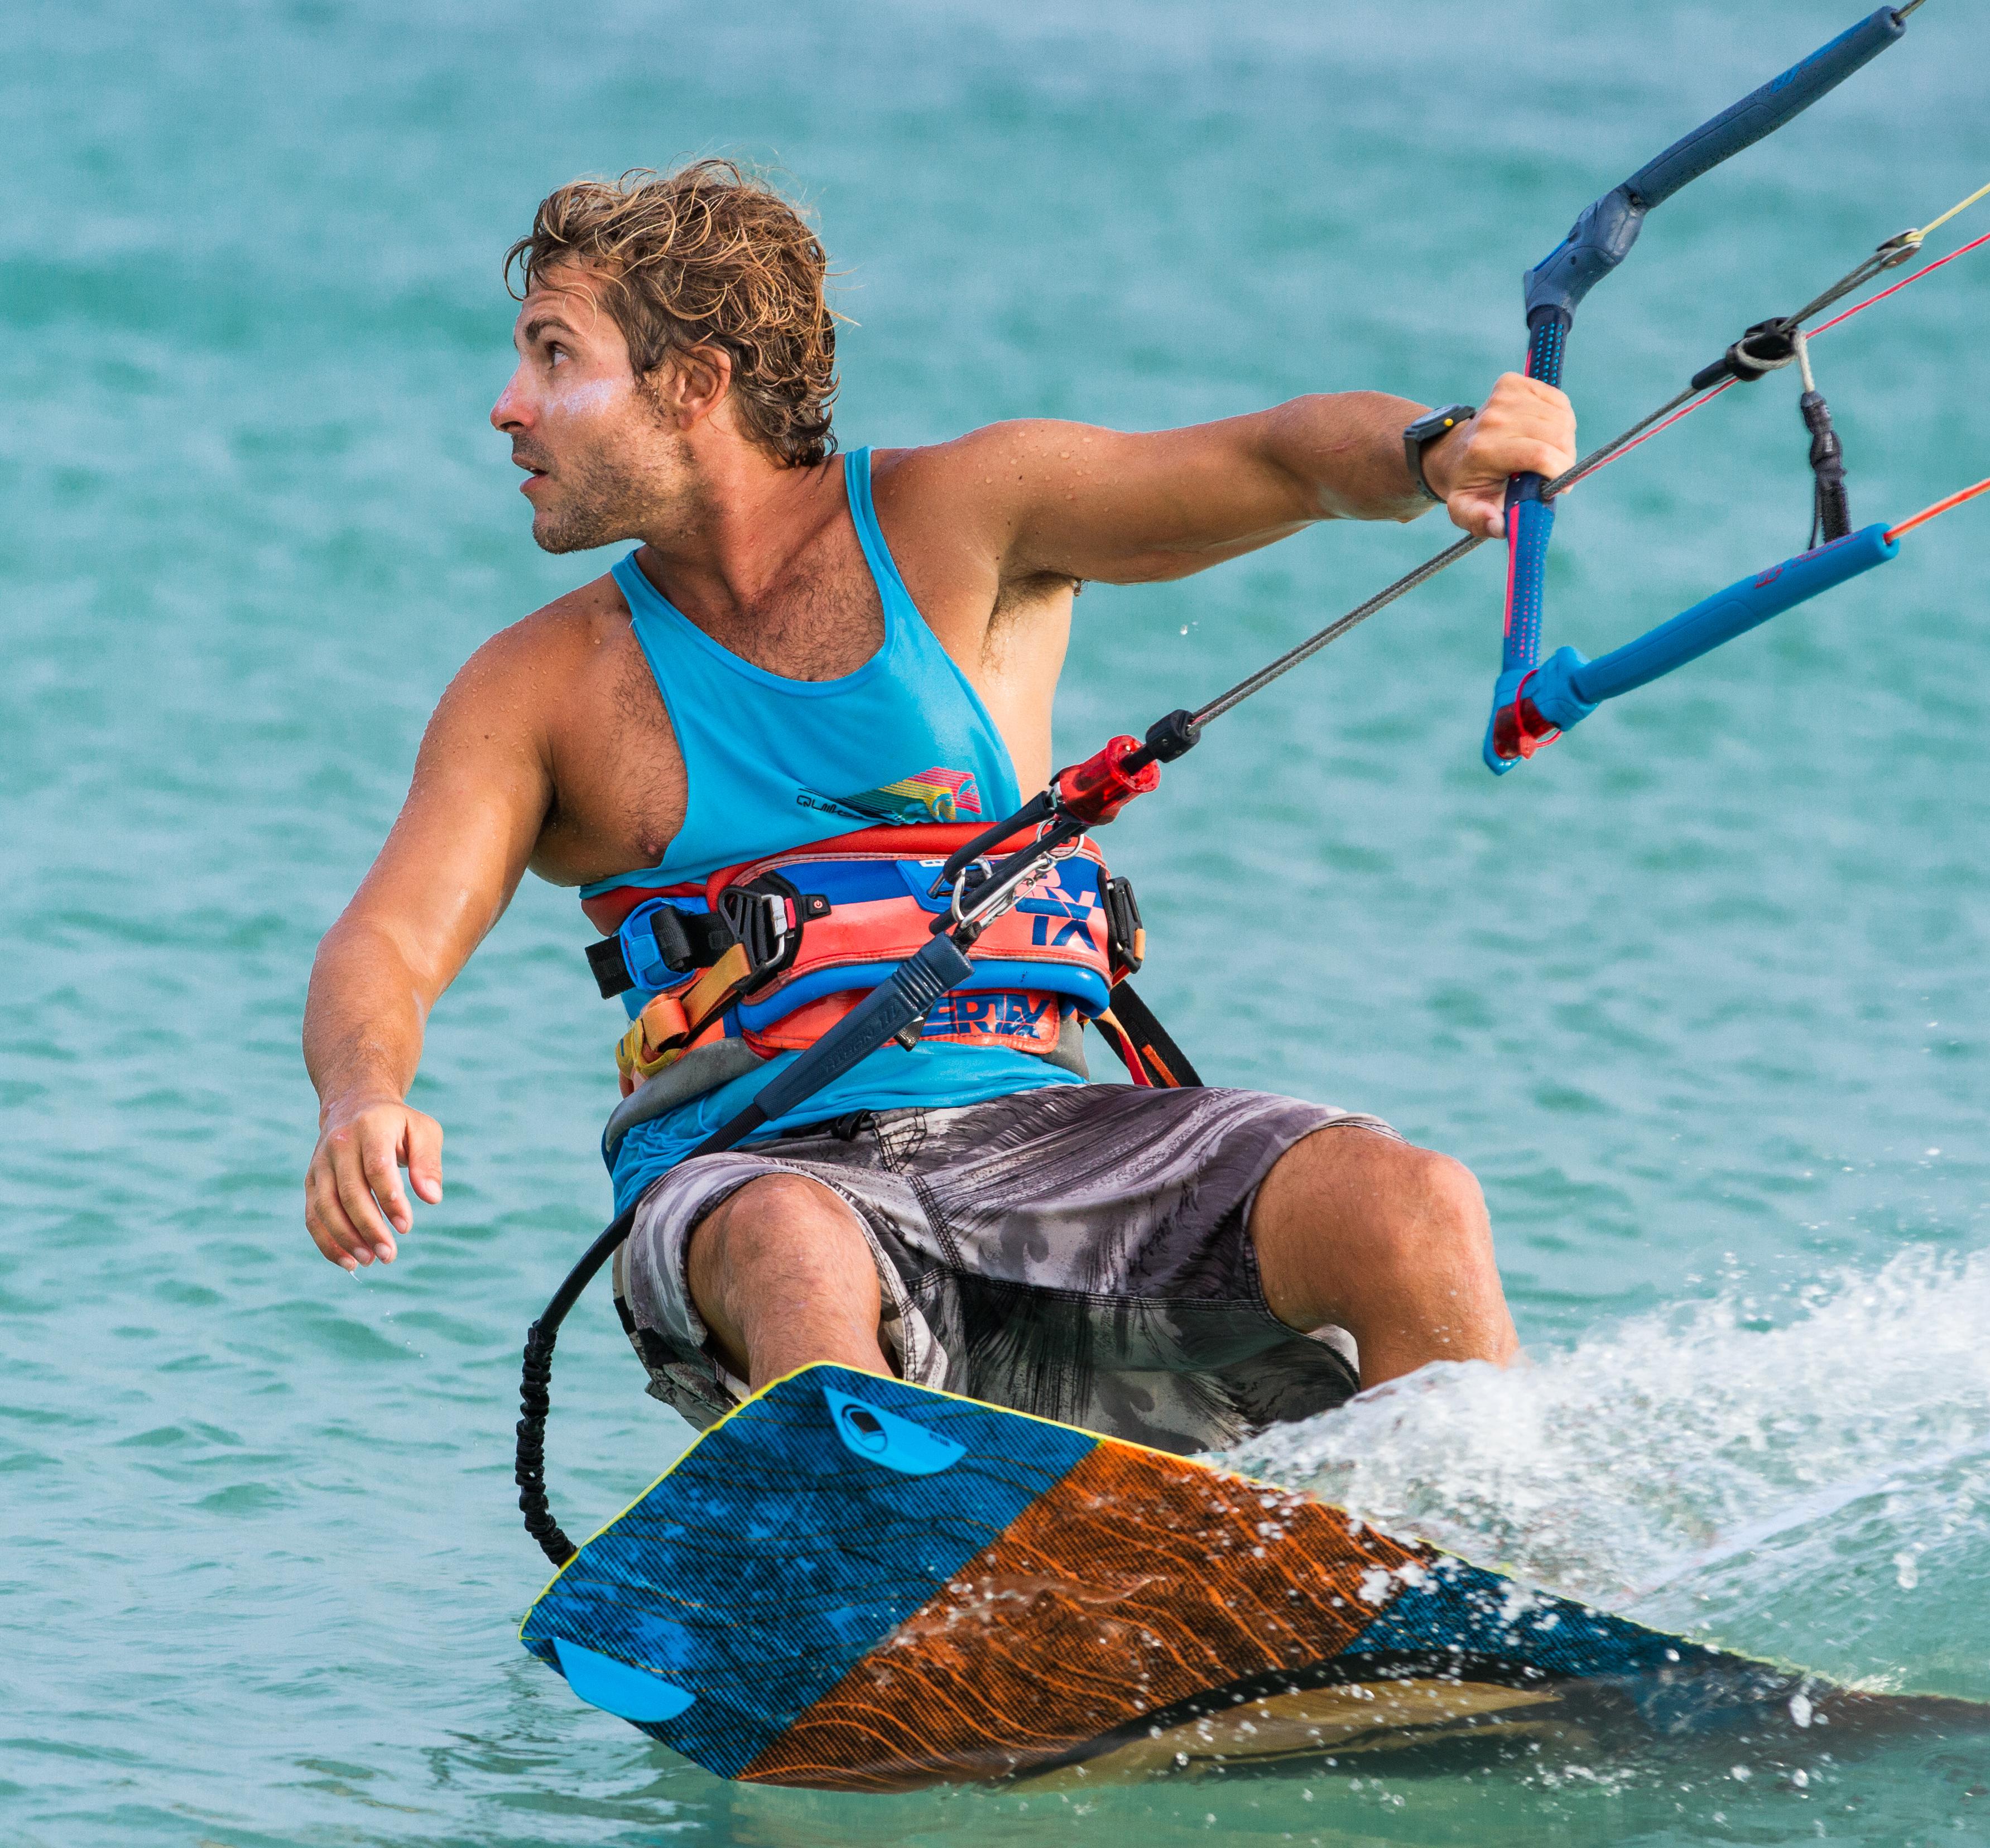 Aruba Kitesurfing Photography Nacho